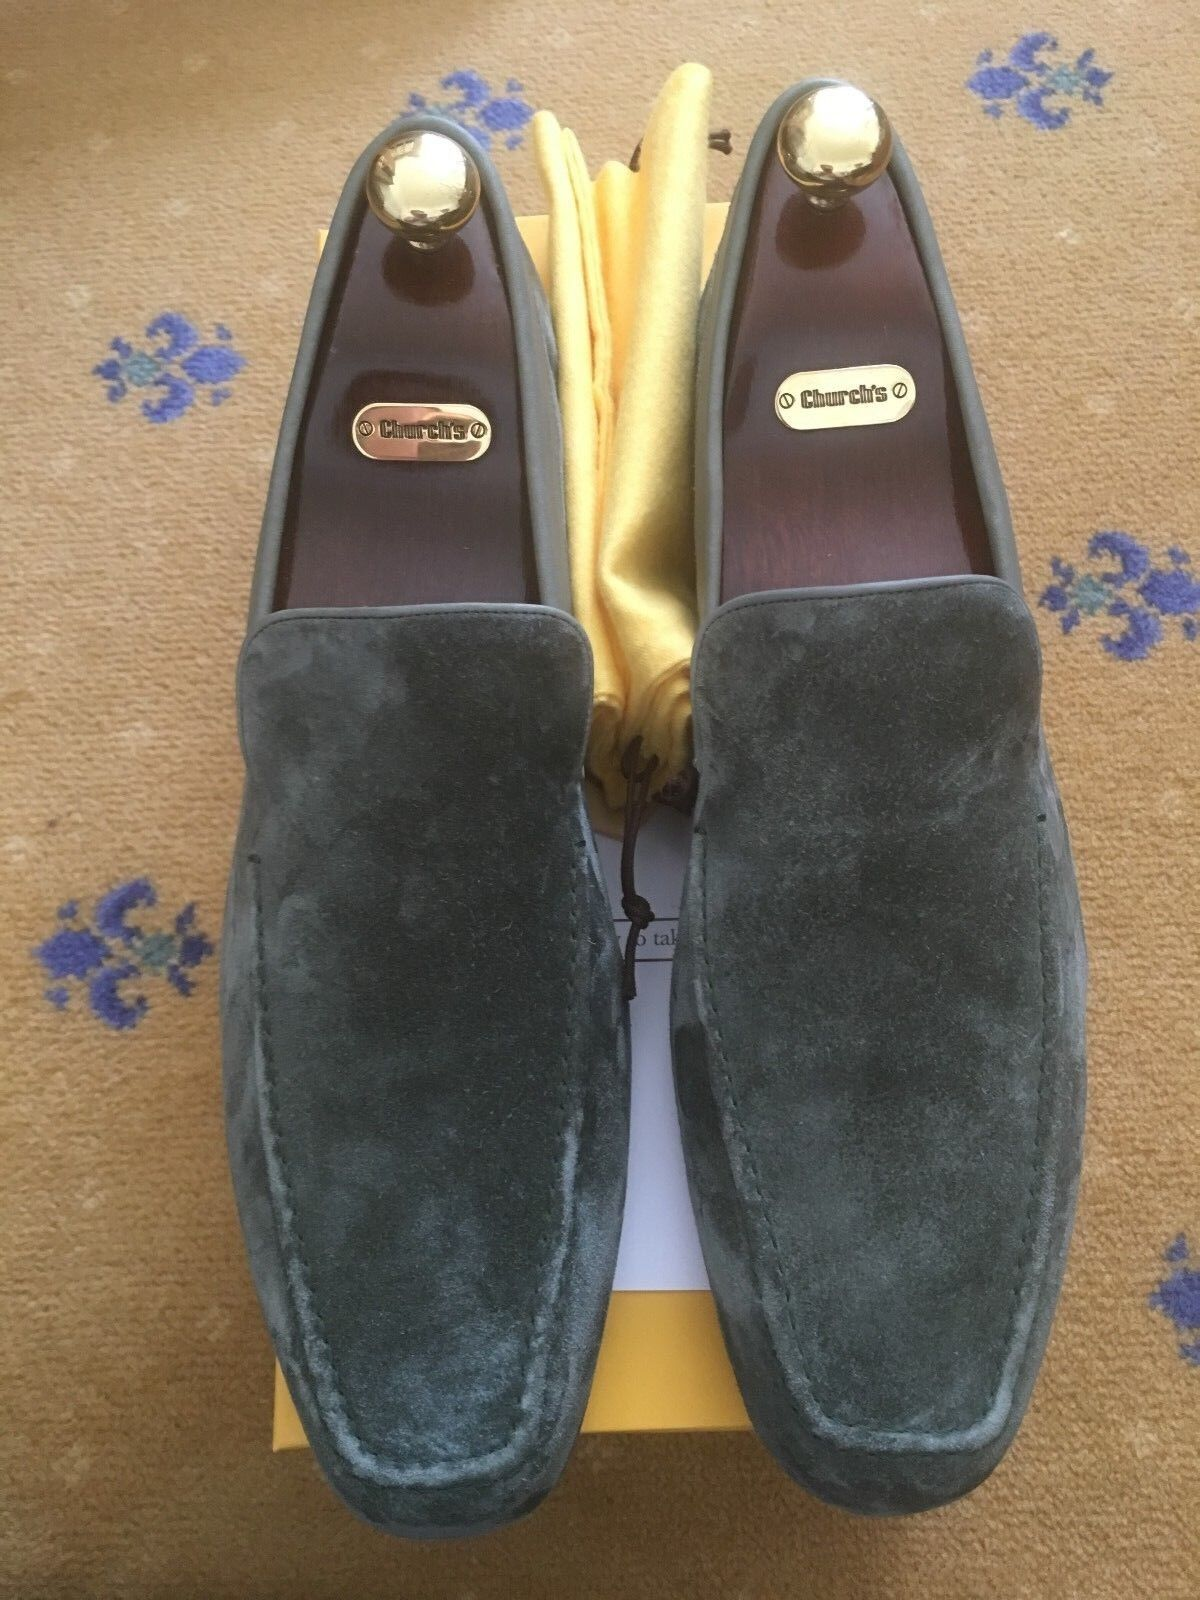 NUOVE Scarpe pelle Da Uomo John Lobb verdi in pelle Scarpe scamosciata Mocassini US 12.5 45.5 Pantofola Casa 7cc0f6